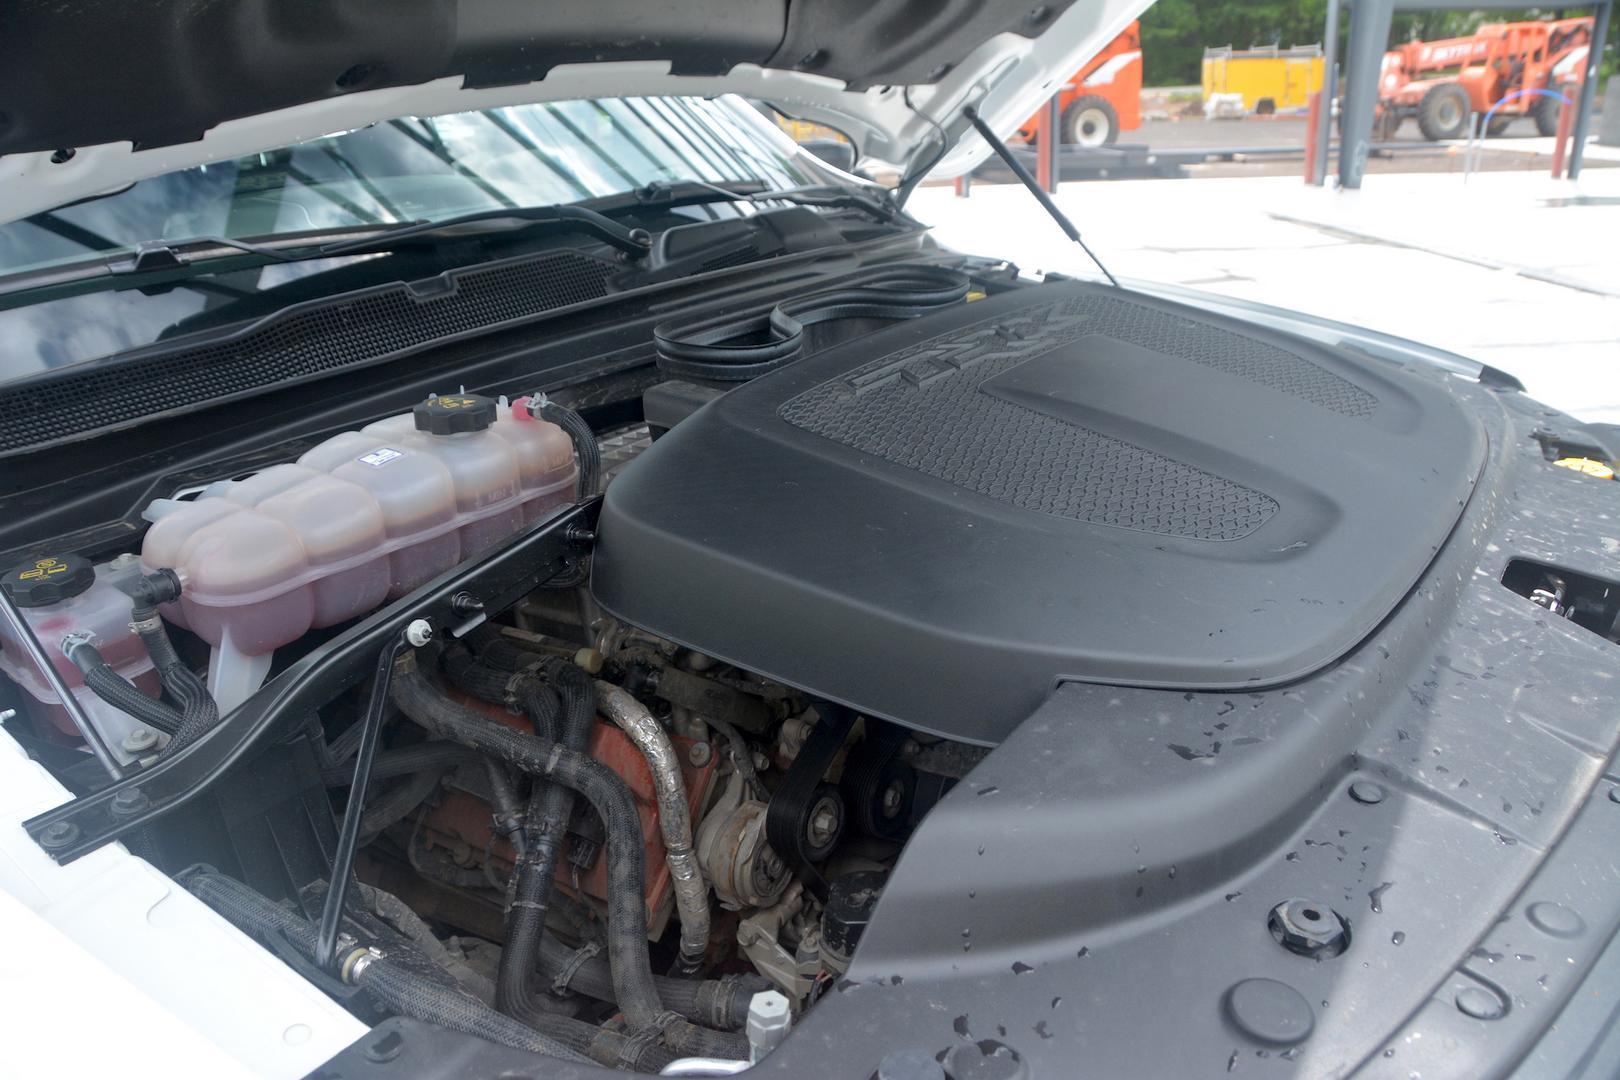 2021 Ram 1500 TRX engine